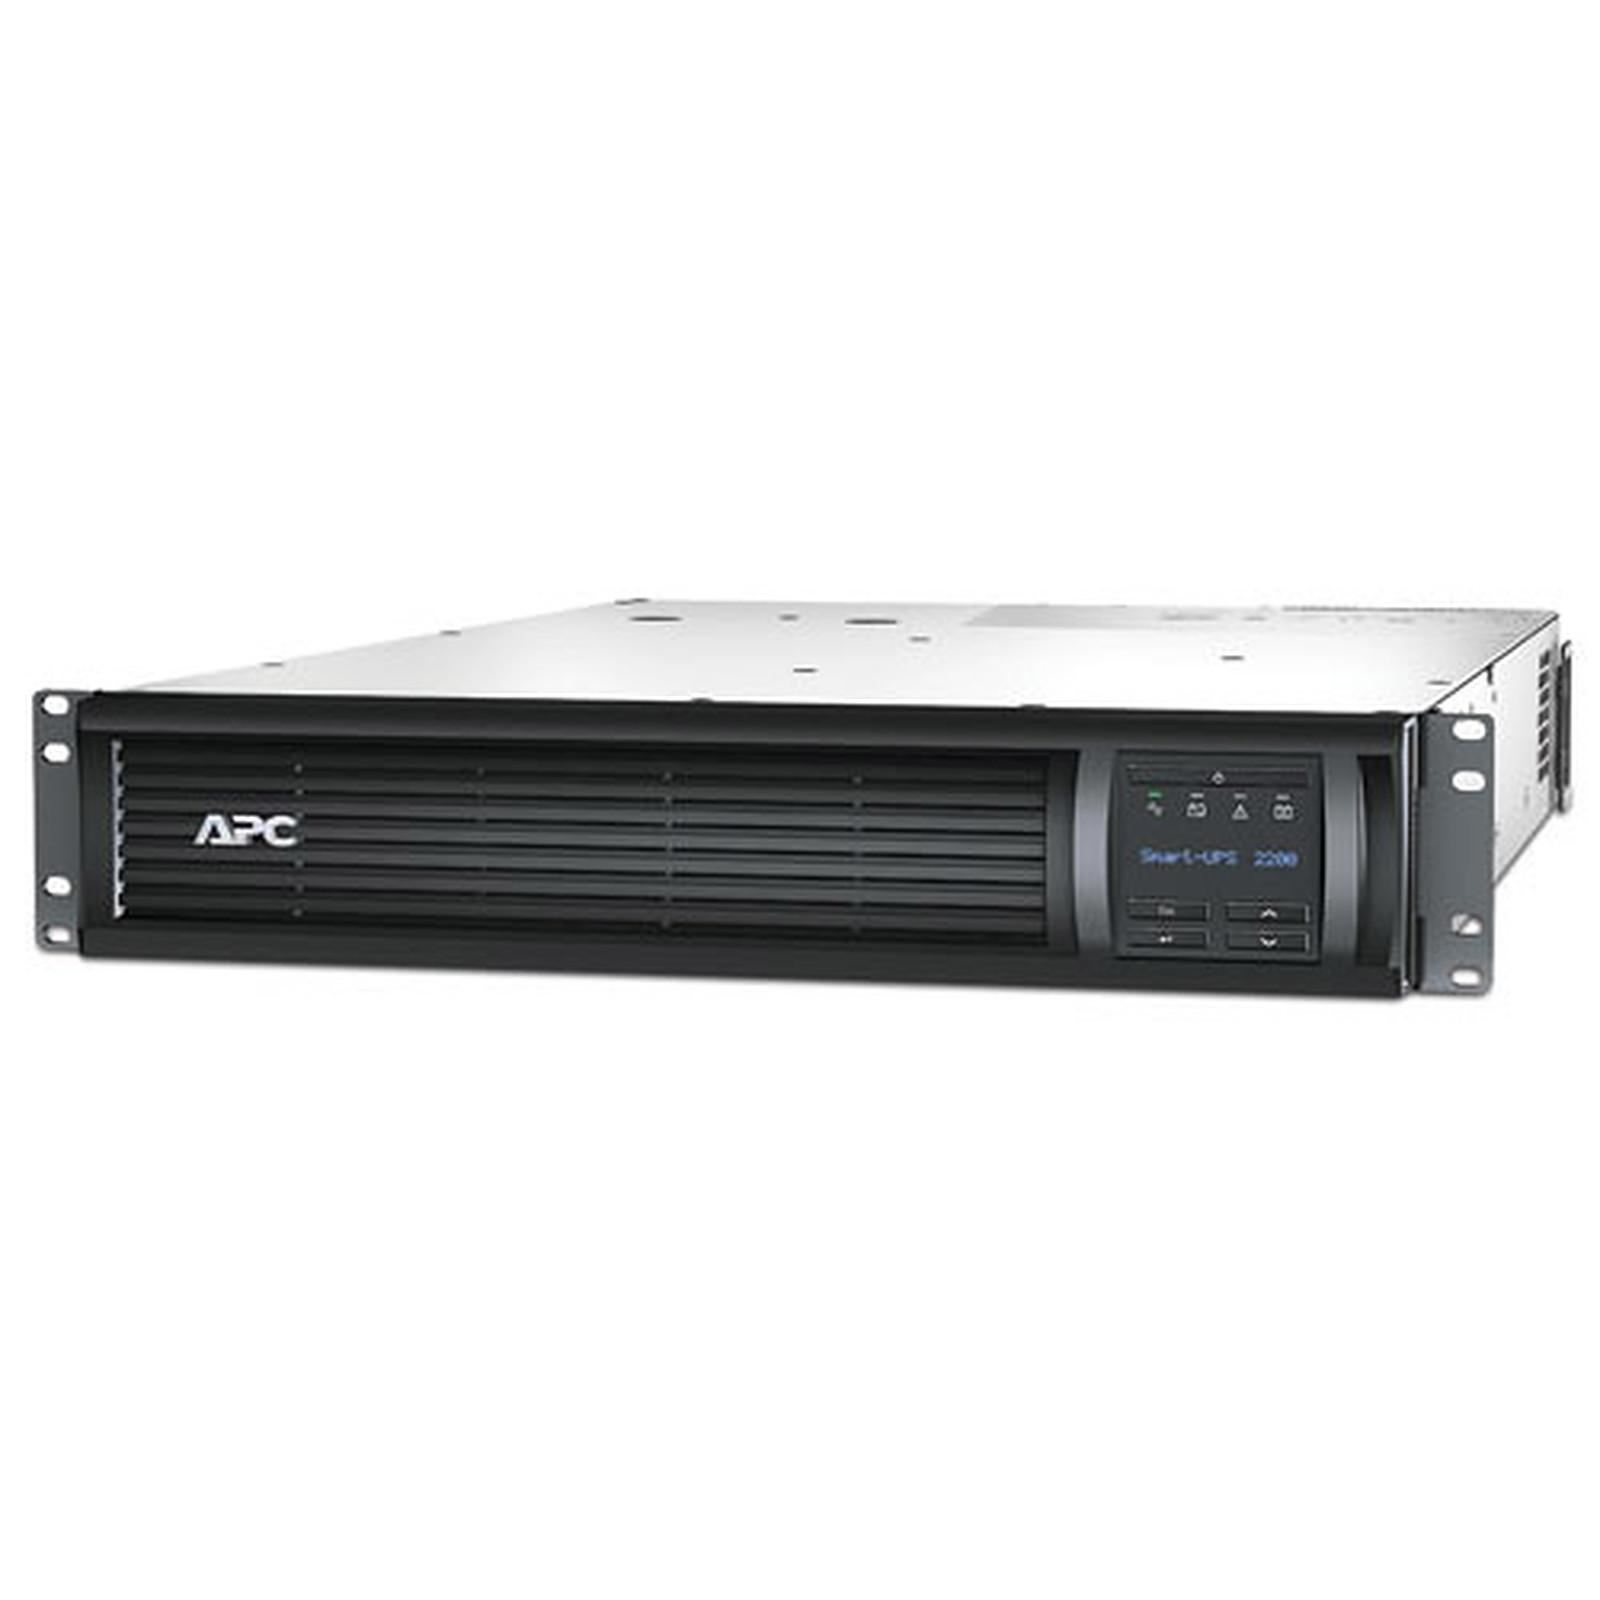 APC Smart-UPS Rack-Mount 2200VA LCD 230V